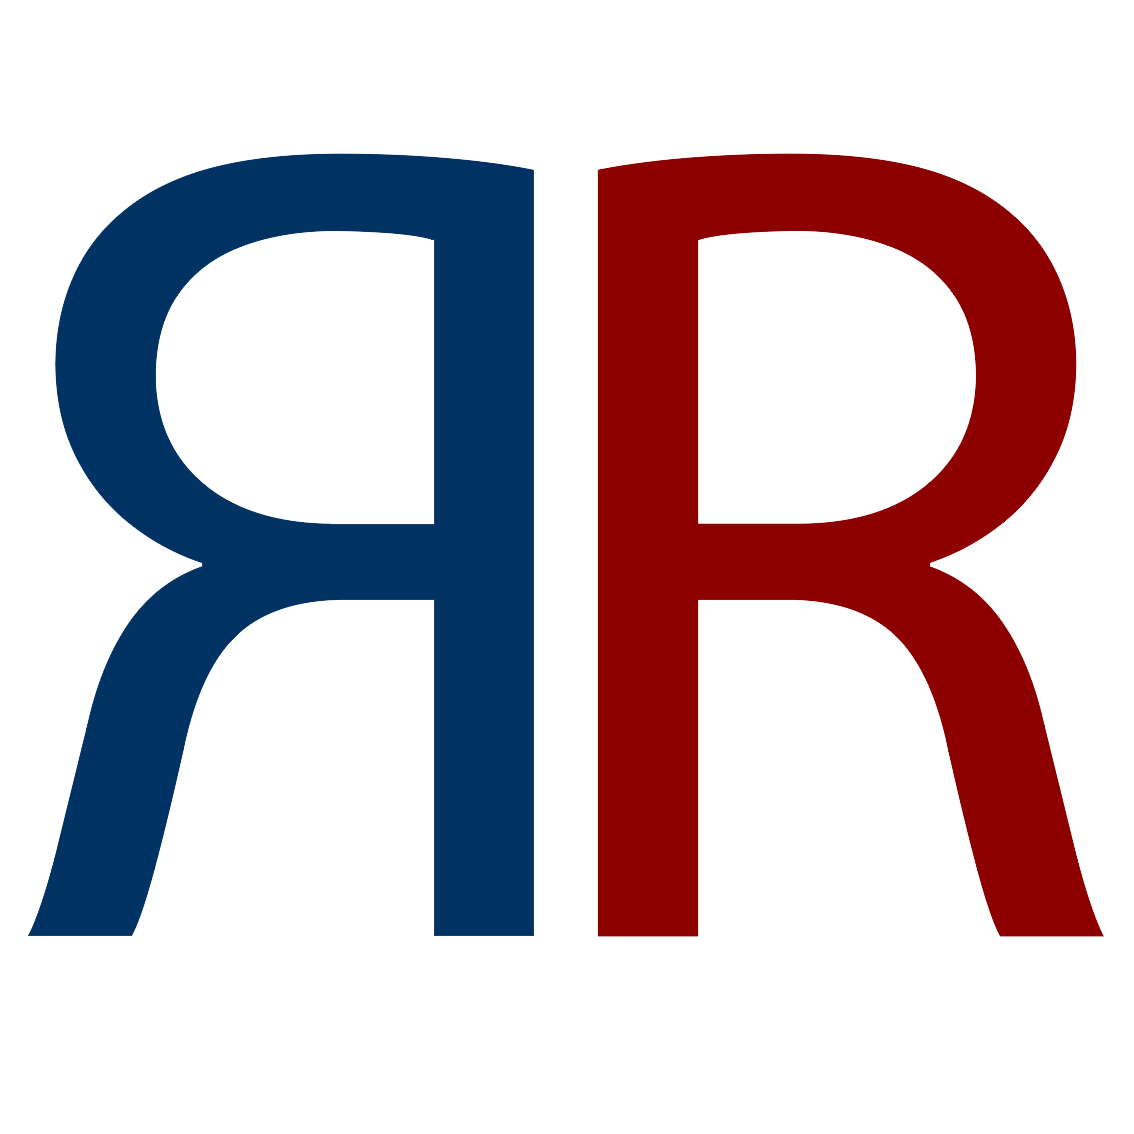 logo RR studio razza milano besana commercialista